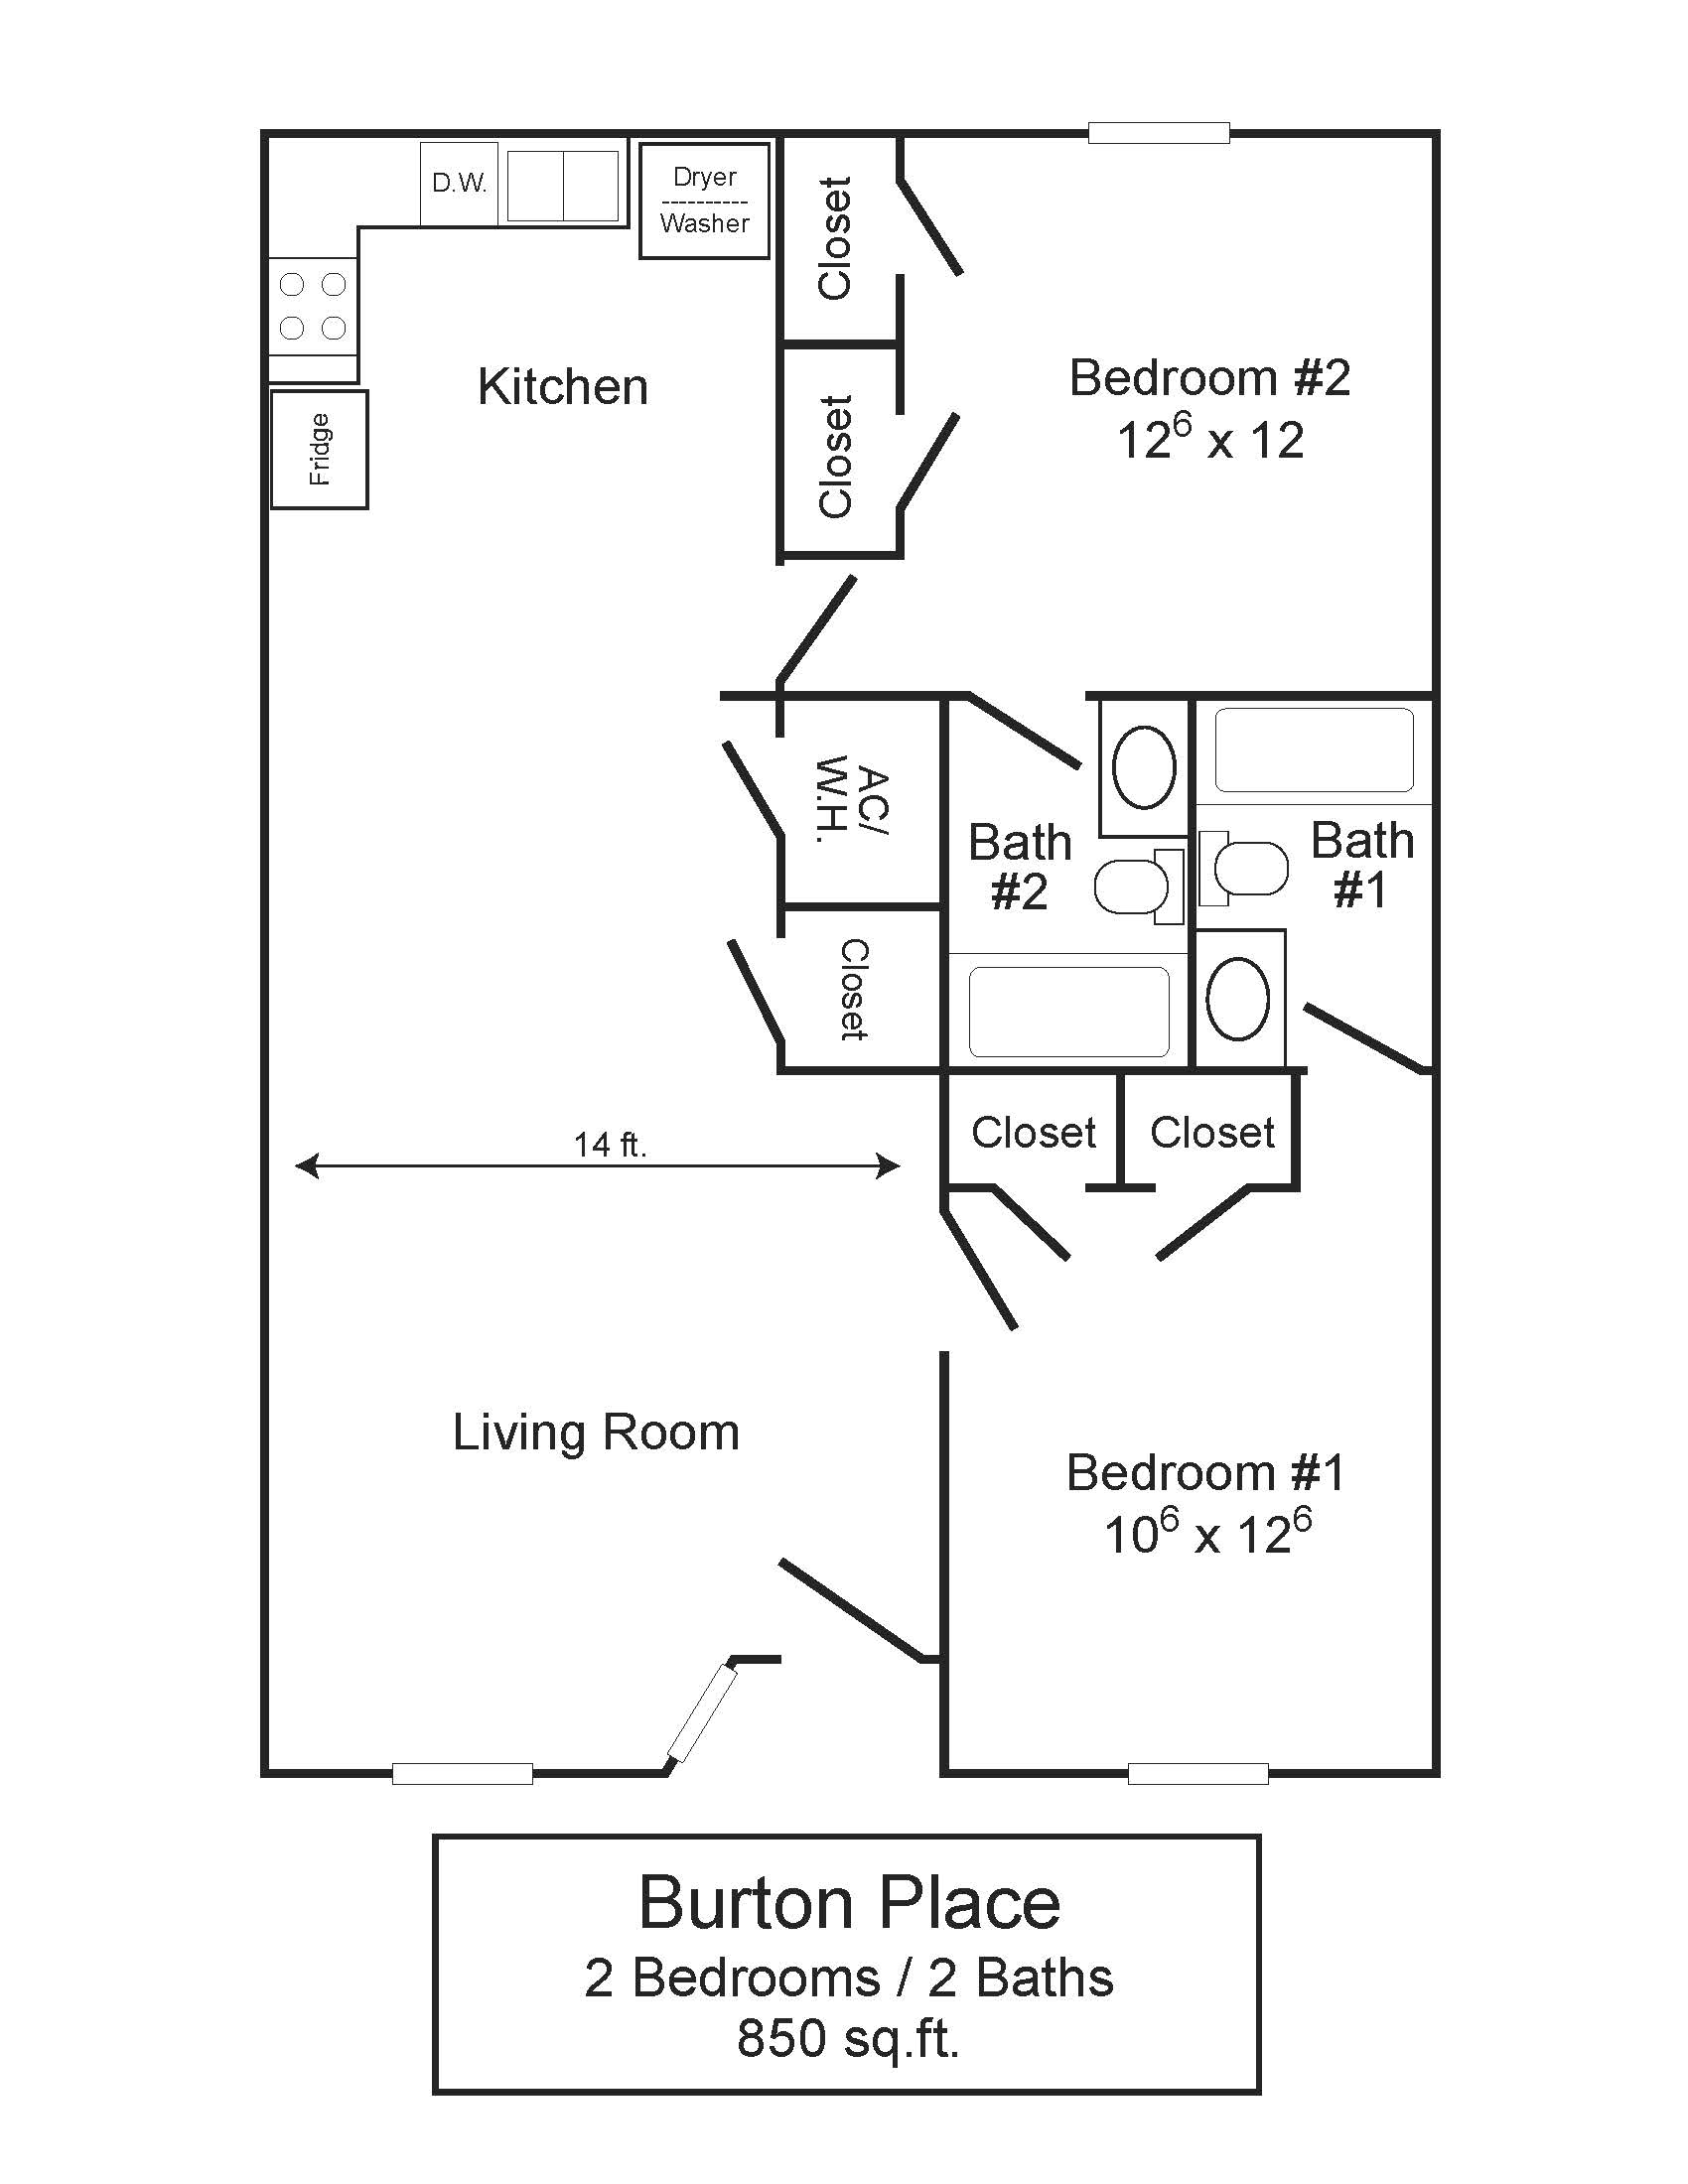 Burton Place 2BR